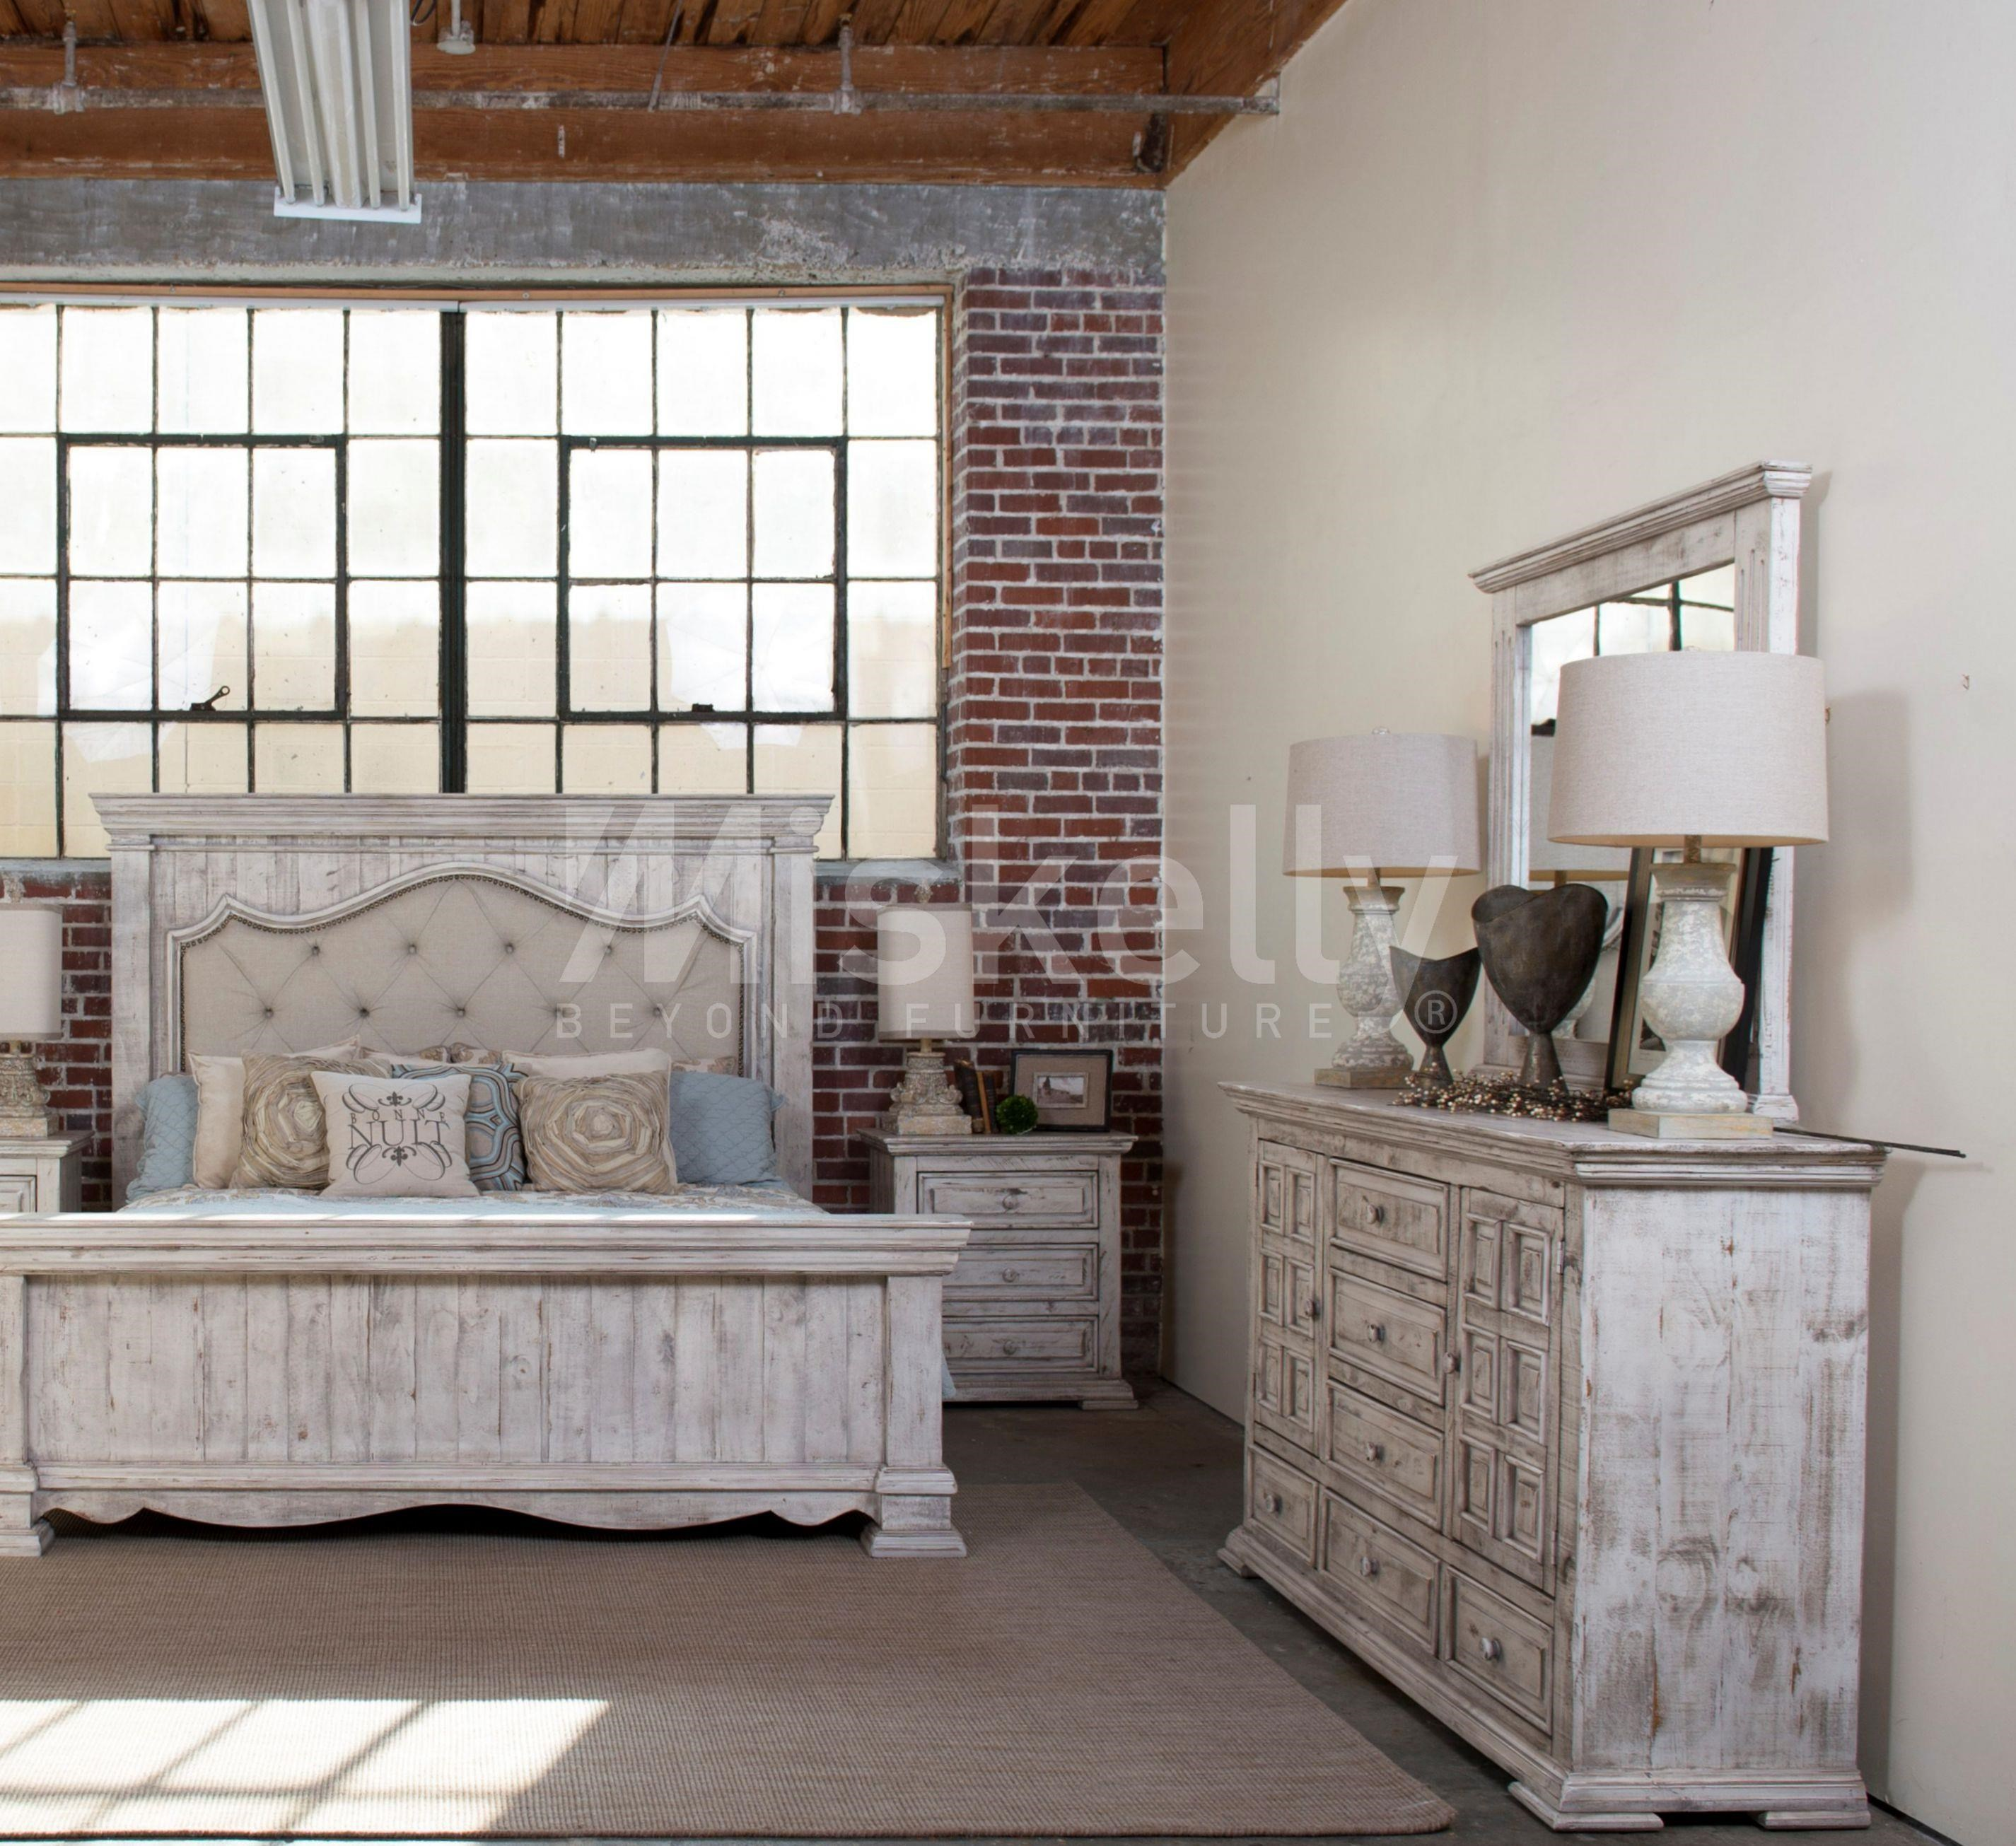 Queen Bed, Dresser, Mirror and Nighstand